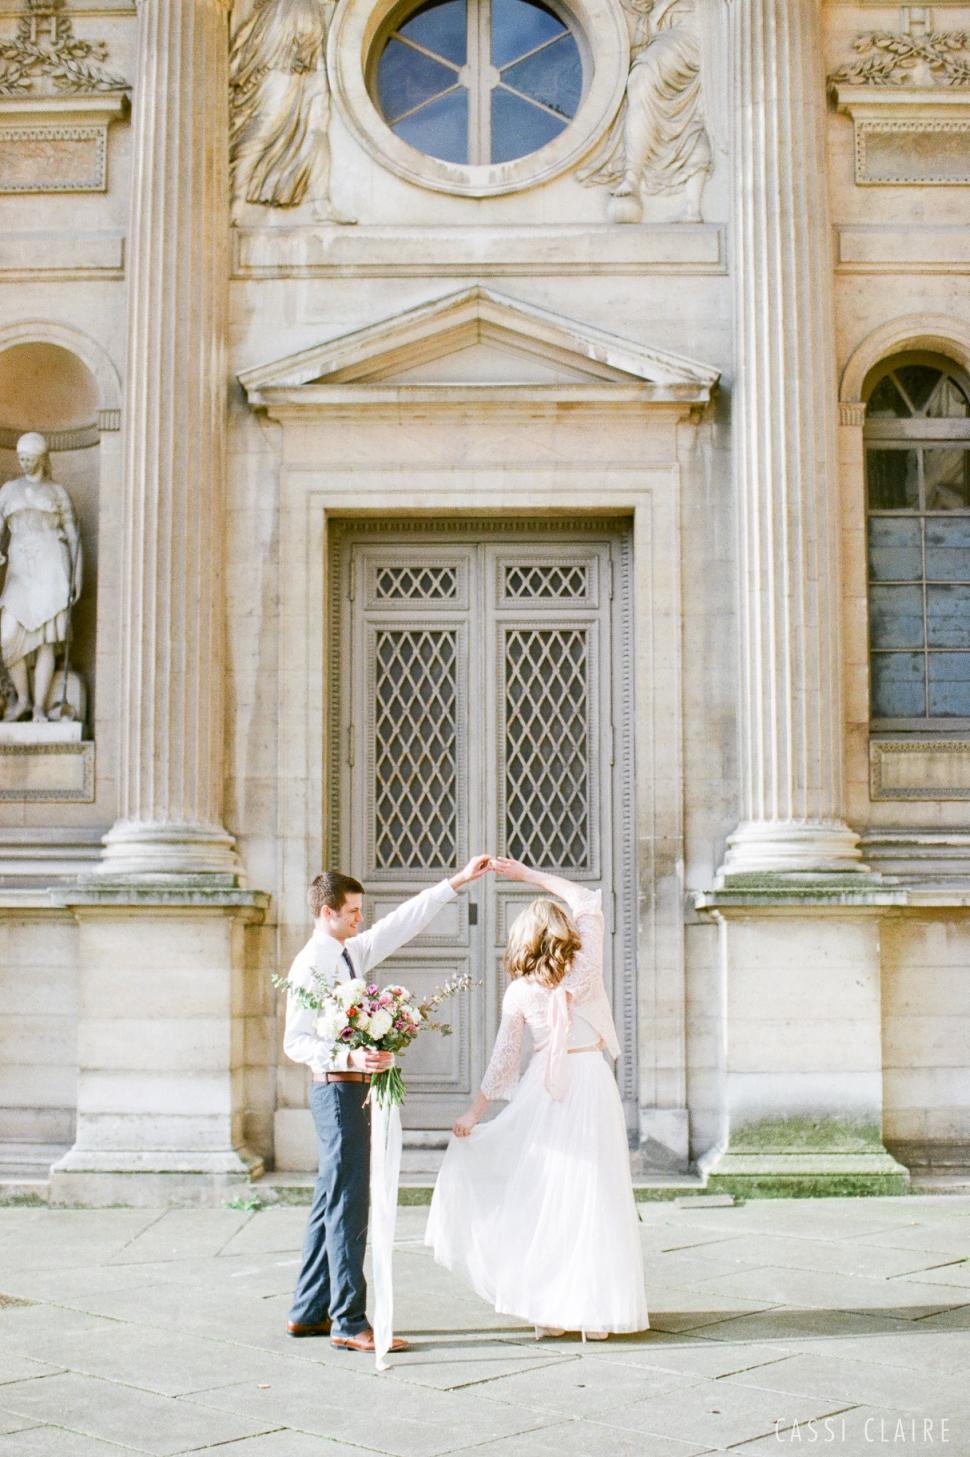 Paris-France-Wedding_CassiClaire_37.jpg